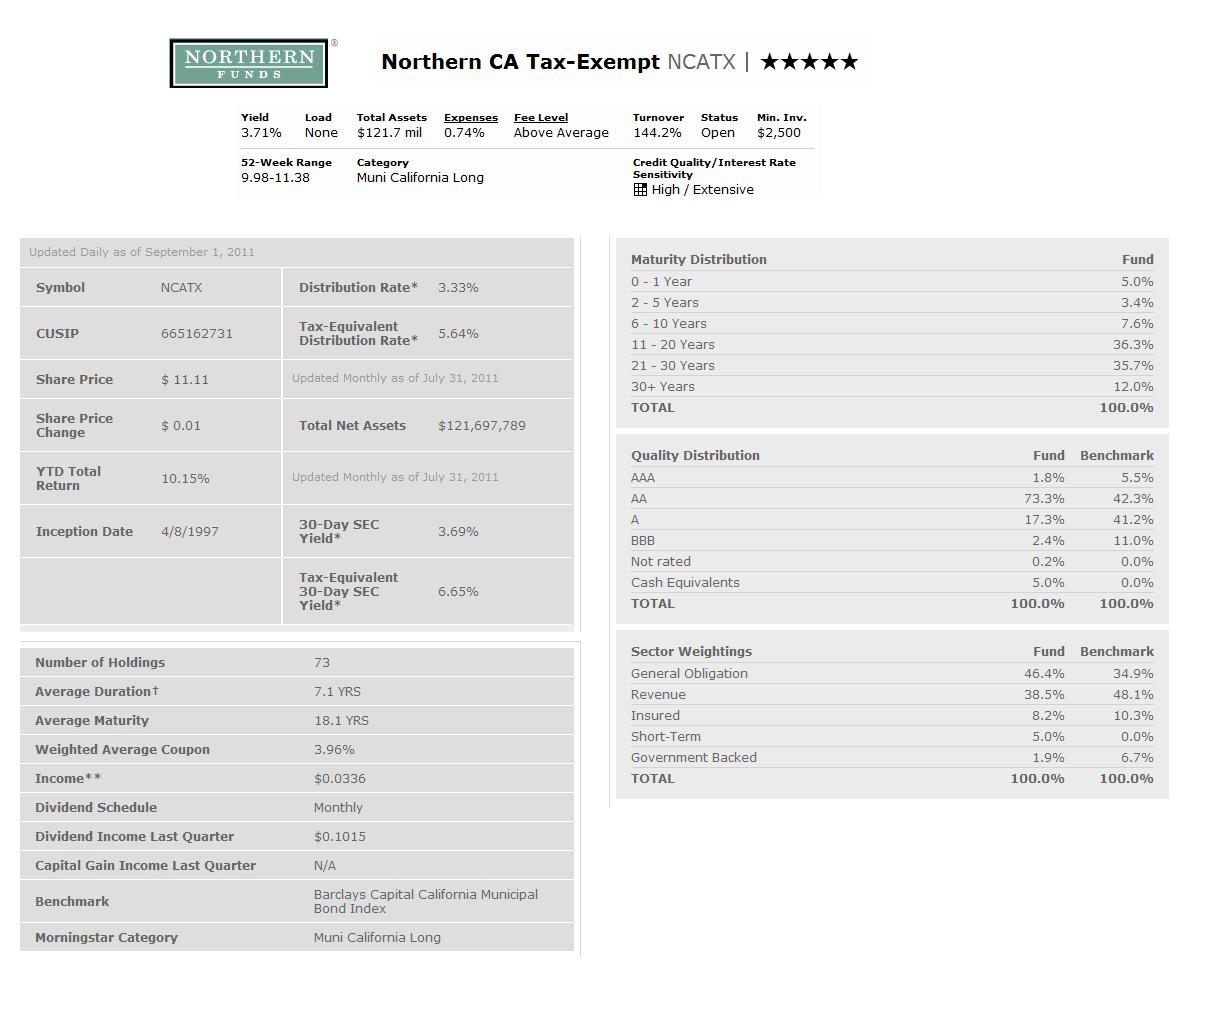 Northern California Tax-Exempt Fund (NCATX) | MEPB Financial